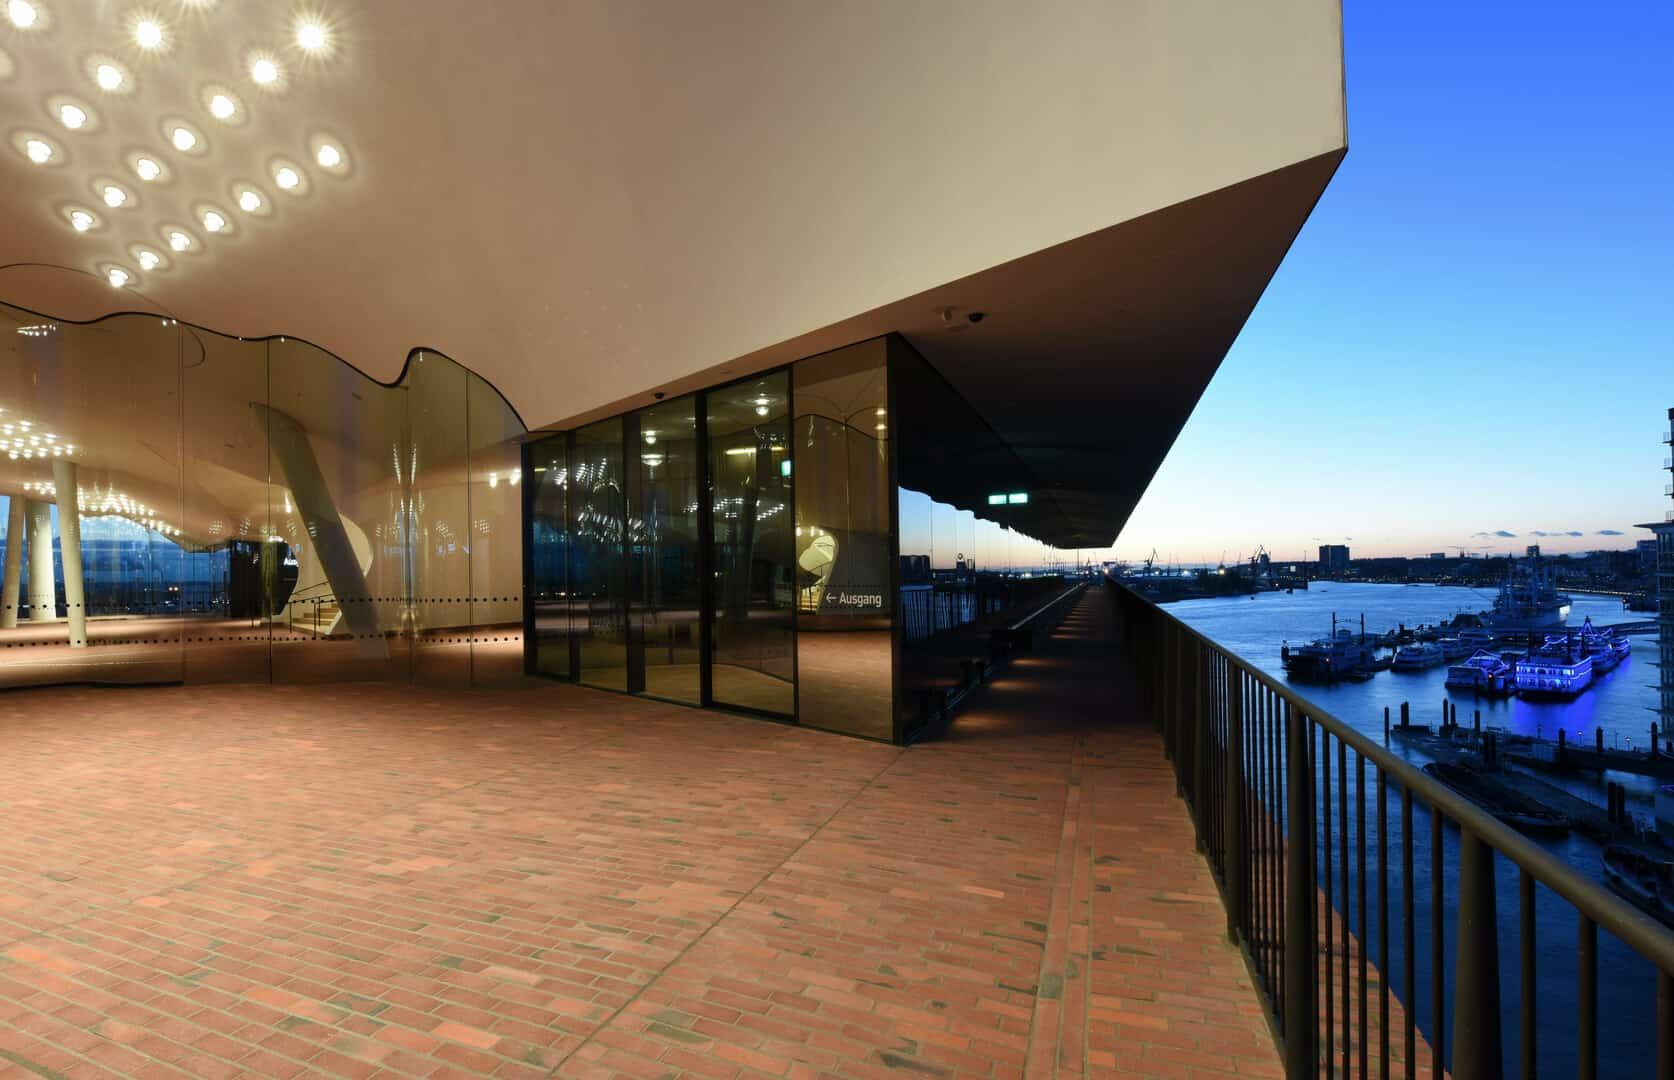 Elbphilharmonie Plaza Führung - Foto: Mediaserver Hamburg / Michael Zapf